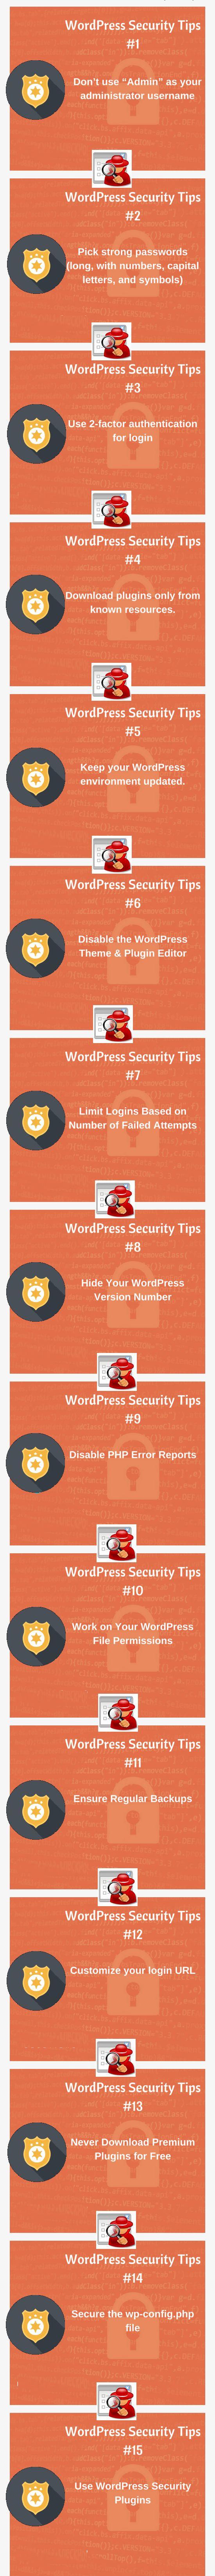 Top-WordPress-Security-Tips-Step-by-Step-2019